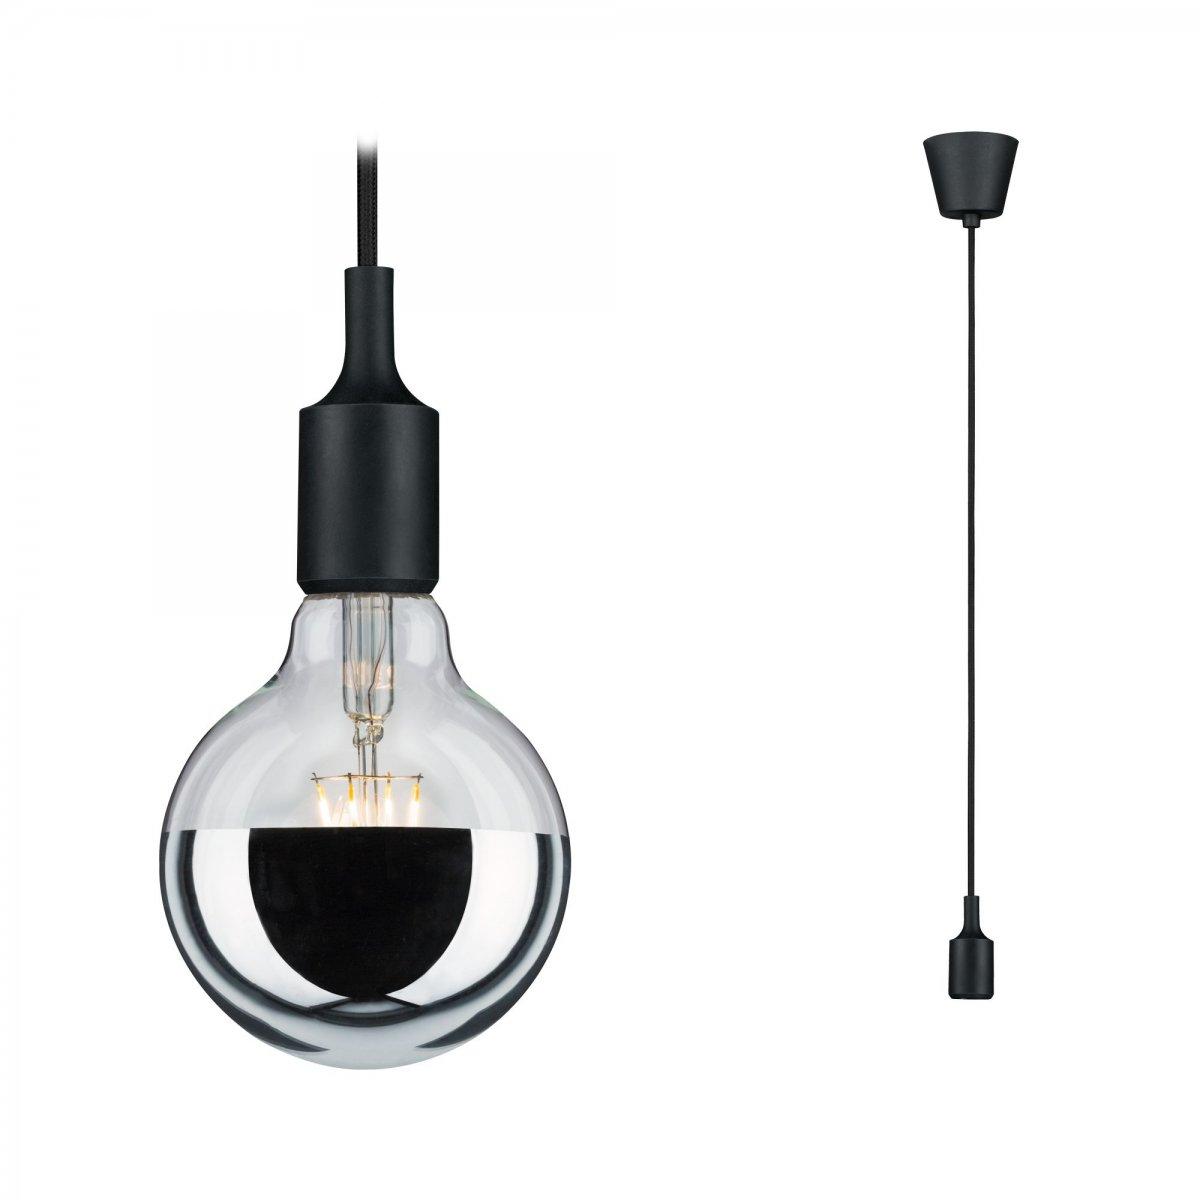 paulmann no 50342 pendel mit e27 fassung schwarz 1 flammig eur 6 79 leuchten lampen led. Black Bedroom Furniture Sets. Home Design Ideas